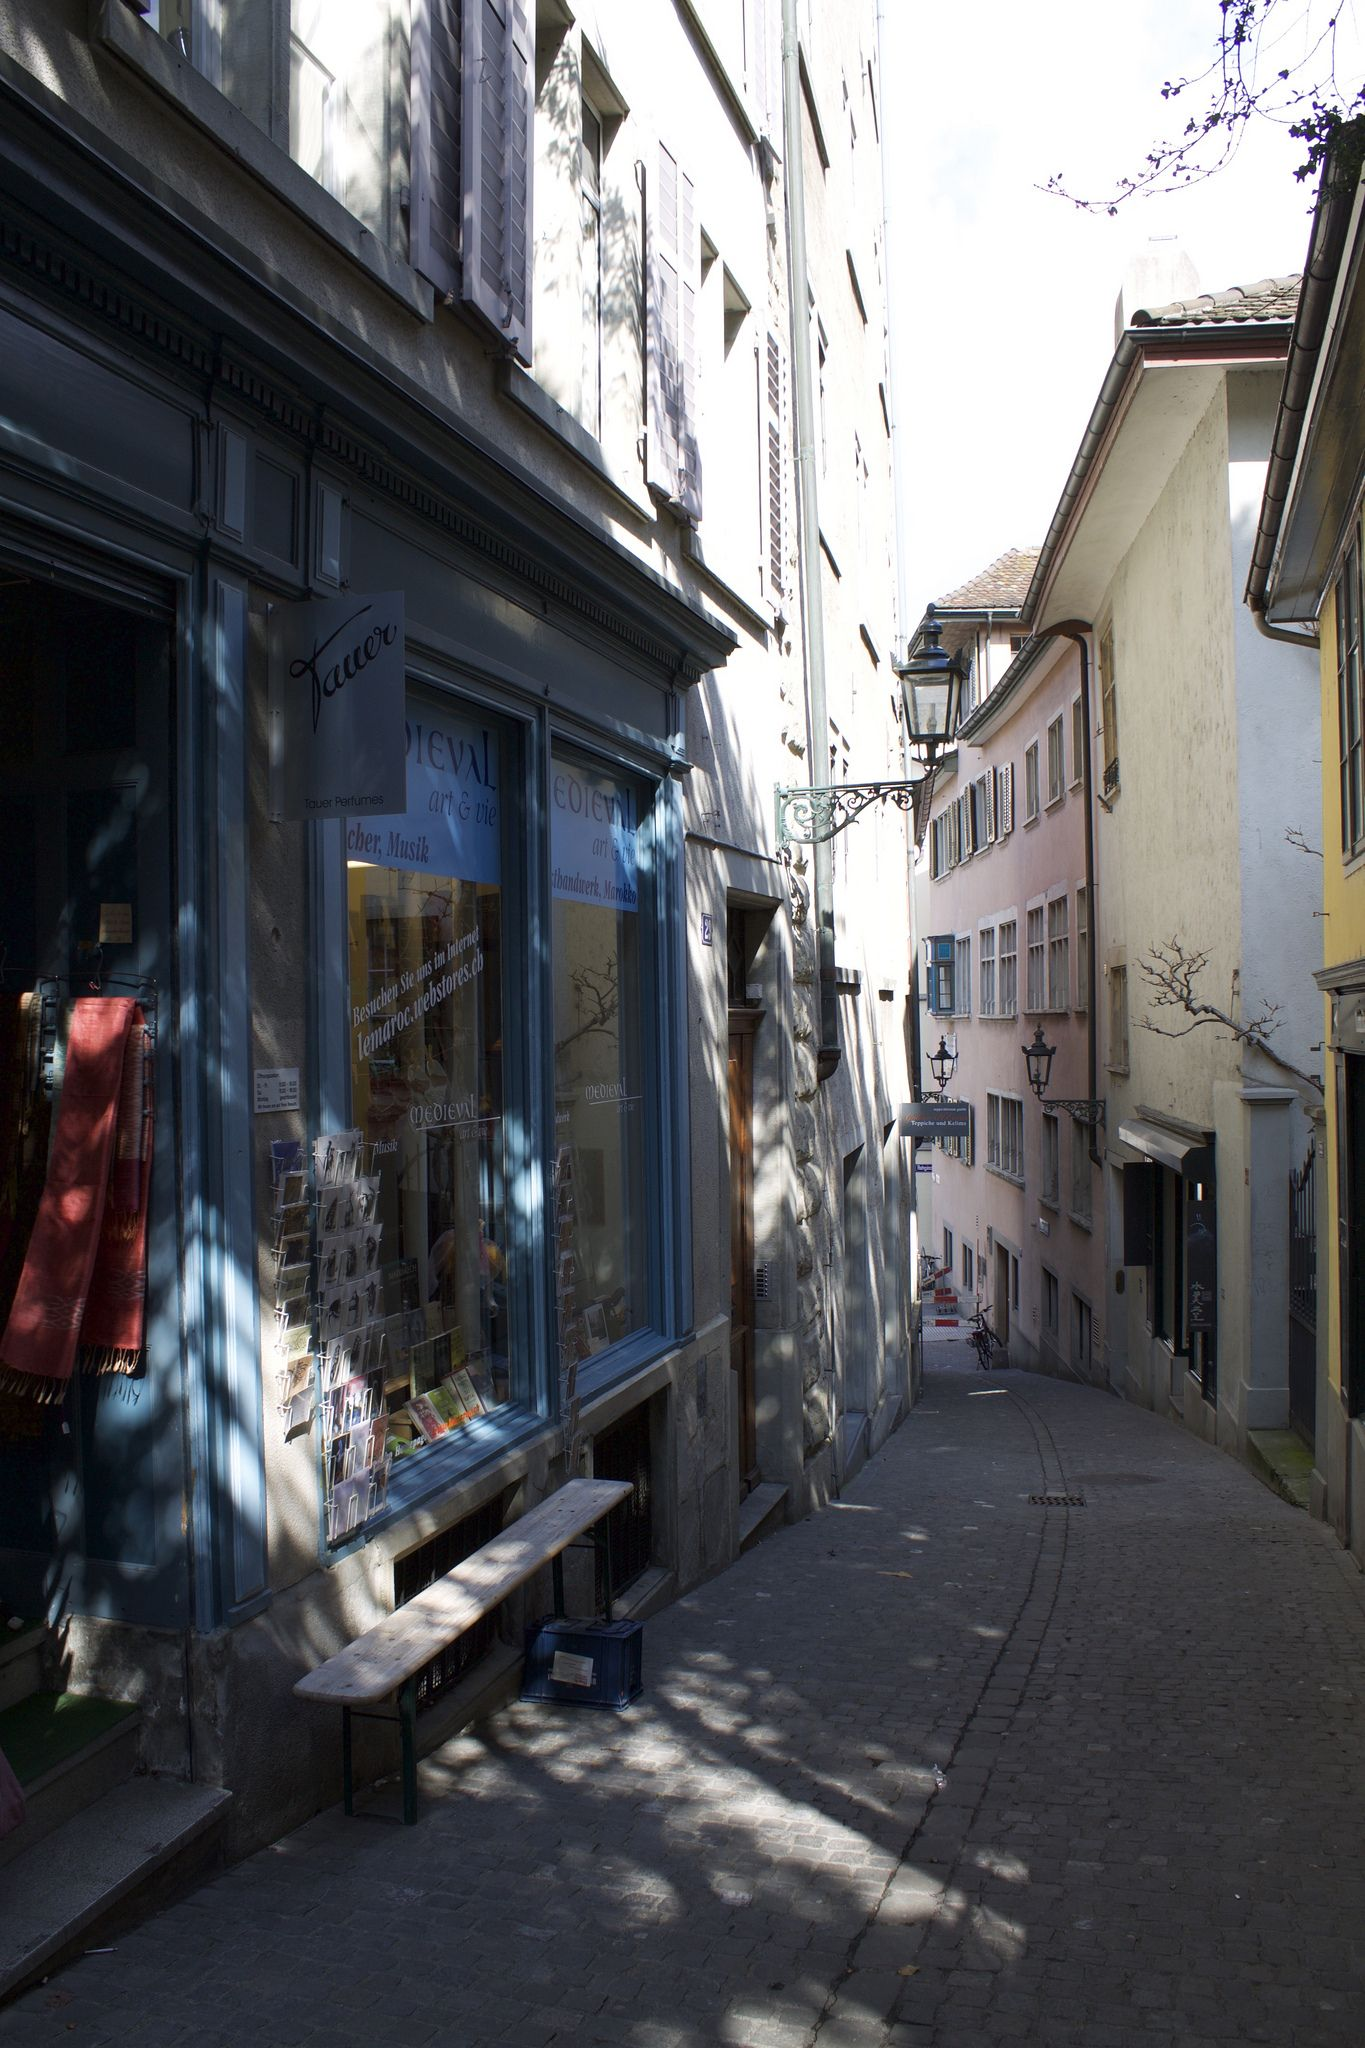 https://flic.kr/p/upDJMh | Zürich | Zürich